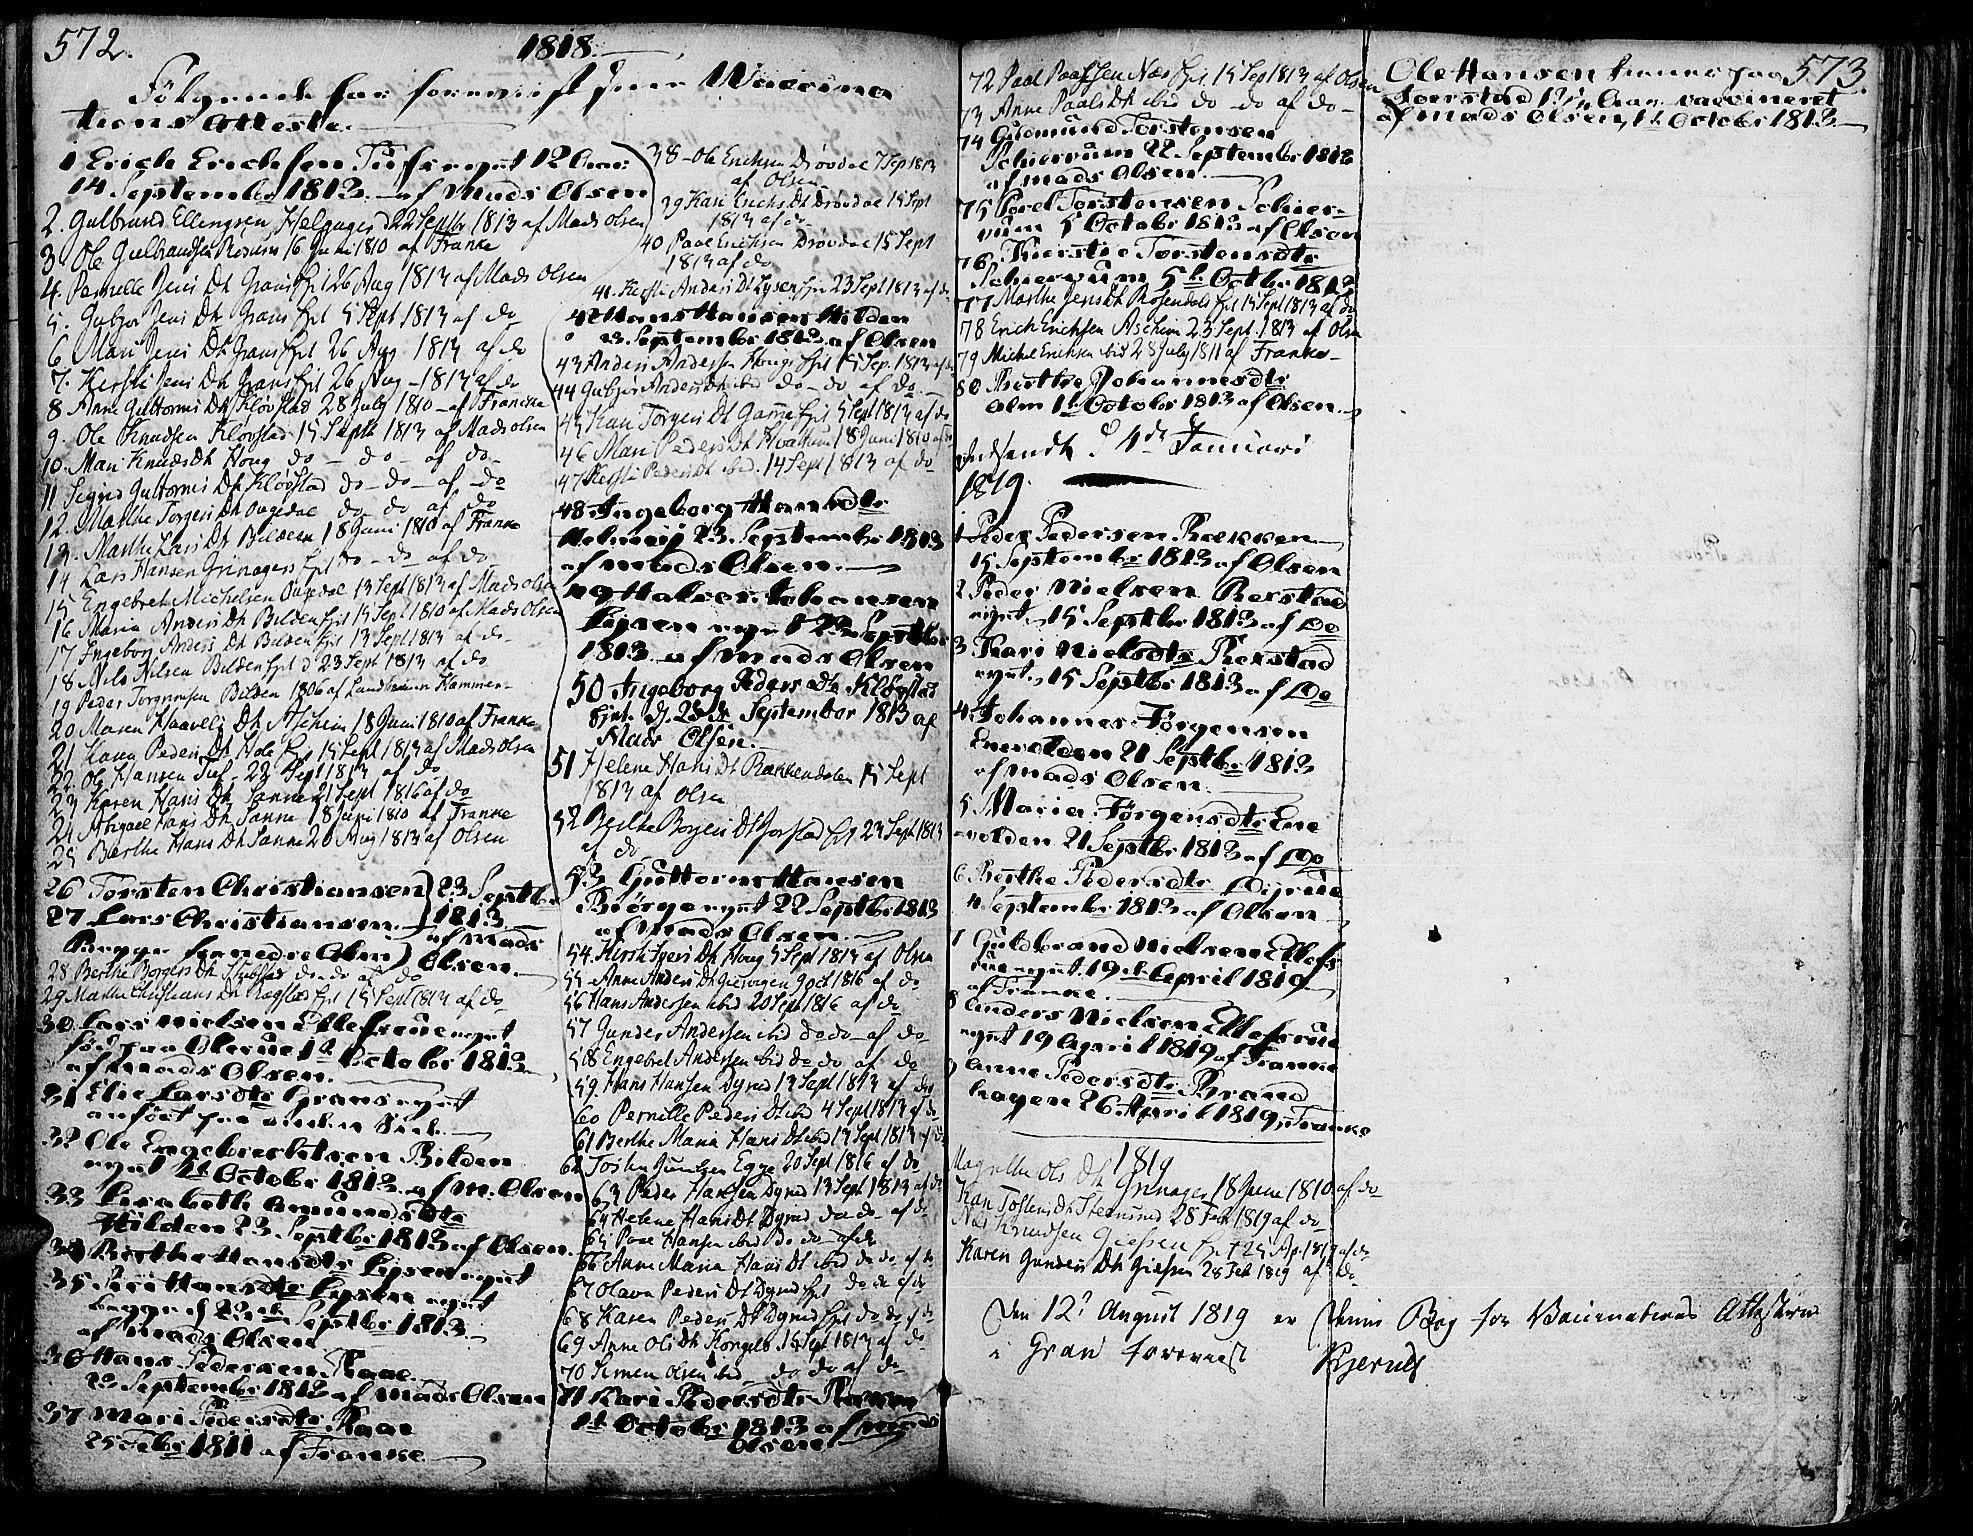 SAH, Gran prestekontor, Ministerialbok nr. 6, 1787-1824, s. 572-573